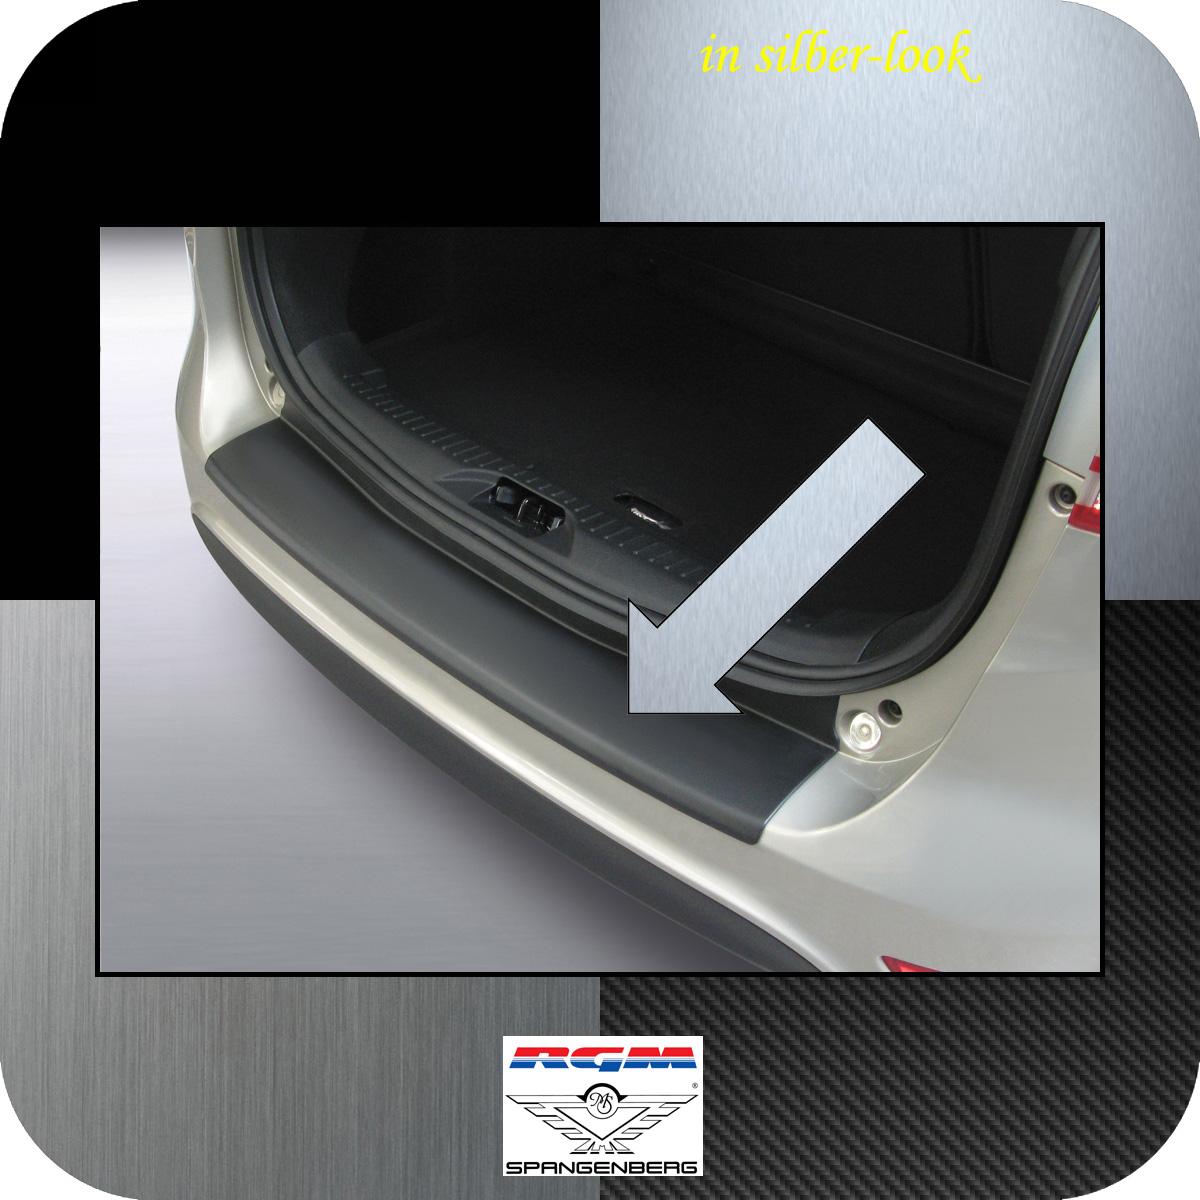 Ladekantenschutz Silber-Look Ford B-MAX Van Kombi Baujahre 2012-2017 3506584